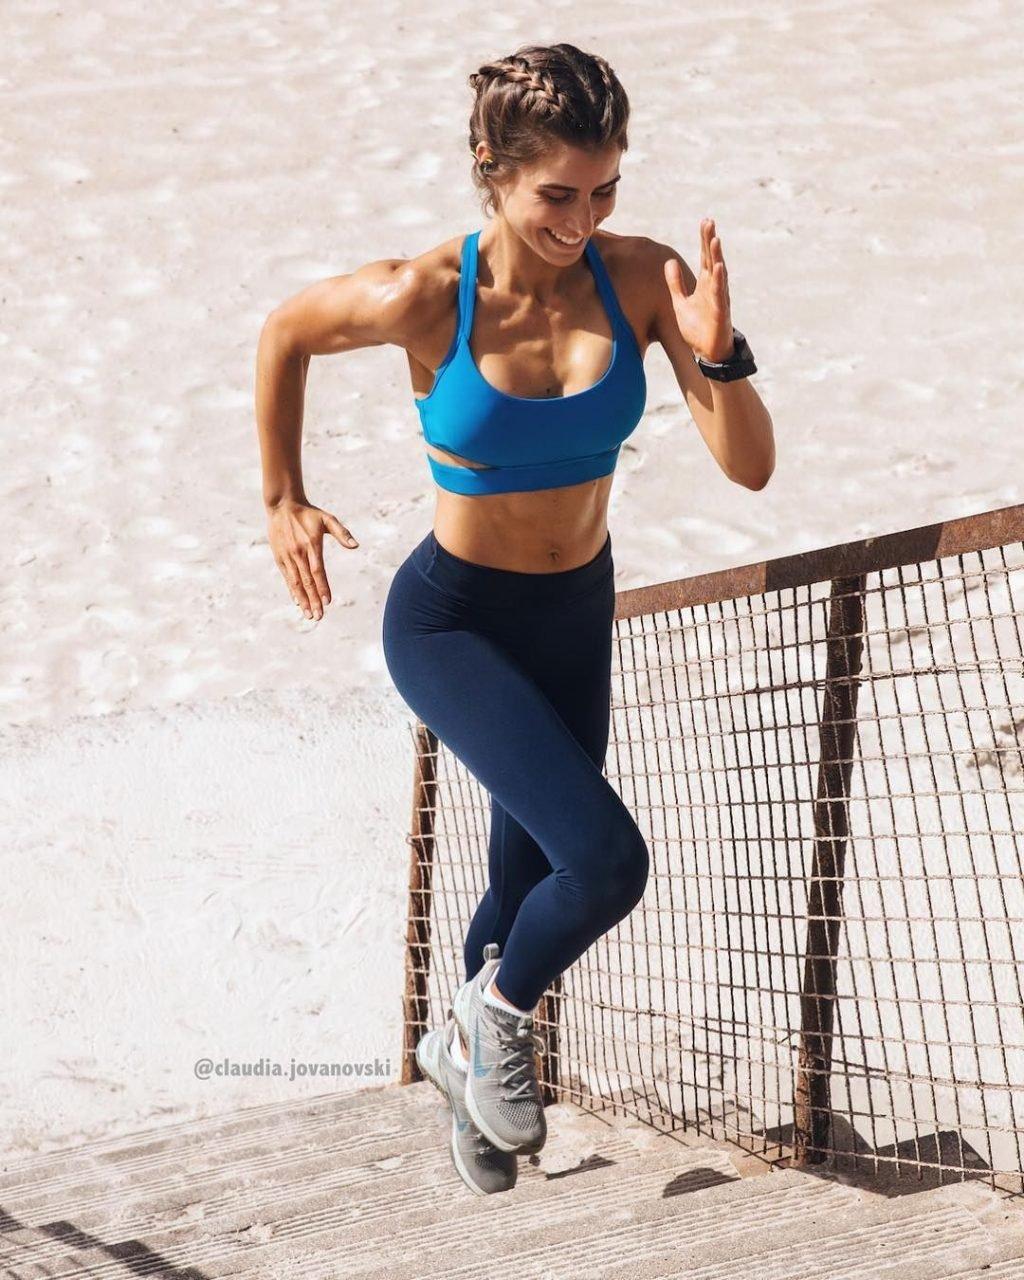 Claudia Jovanovski Sexy & Topless (61 Photos)